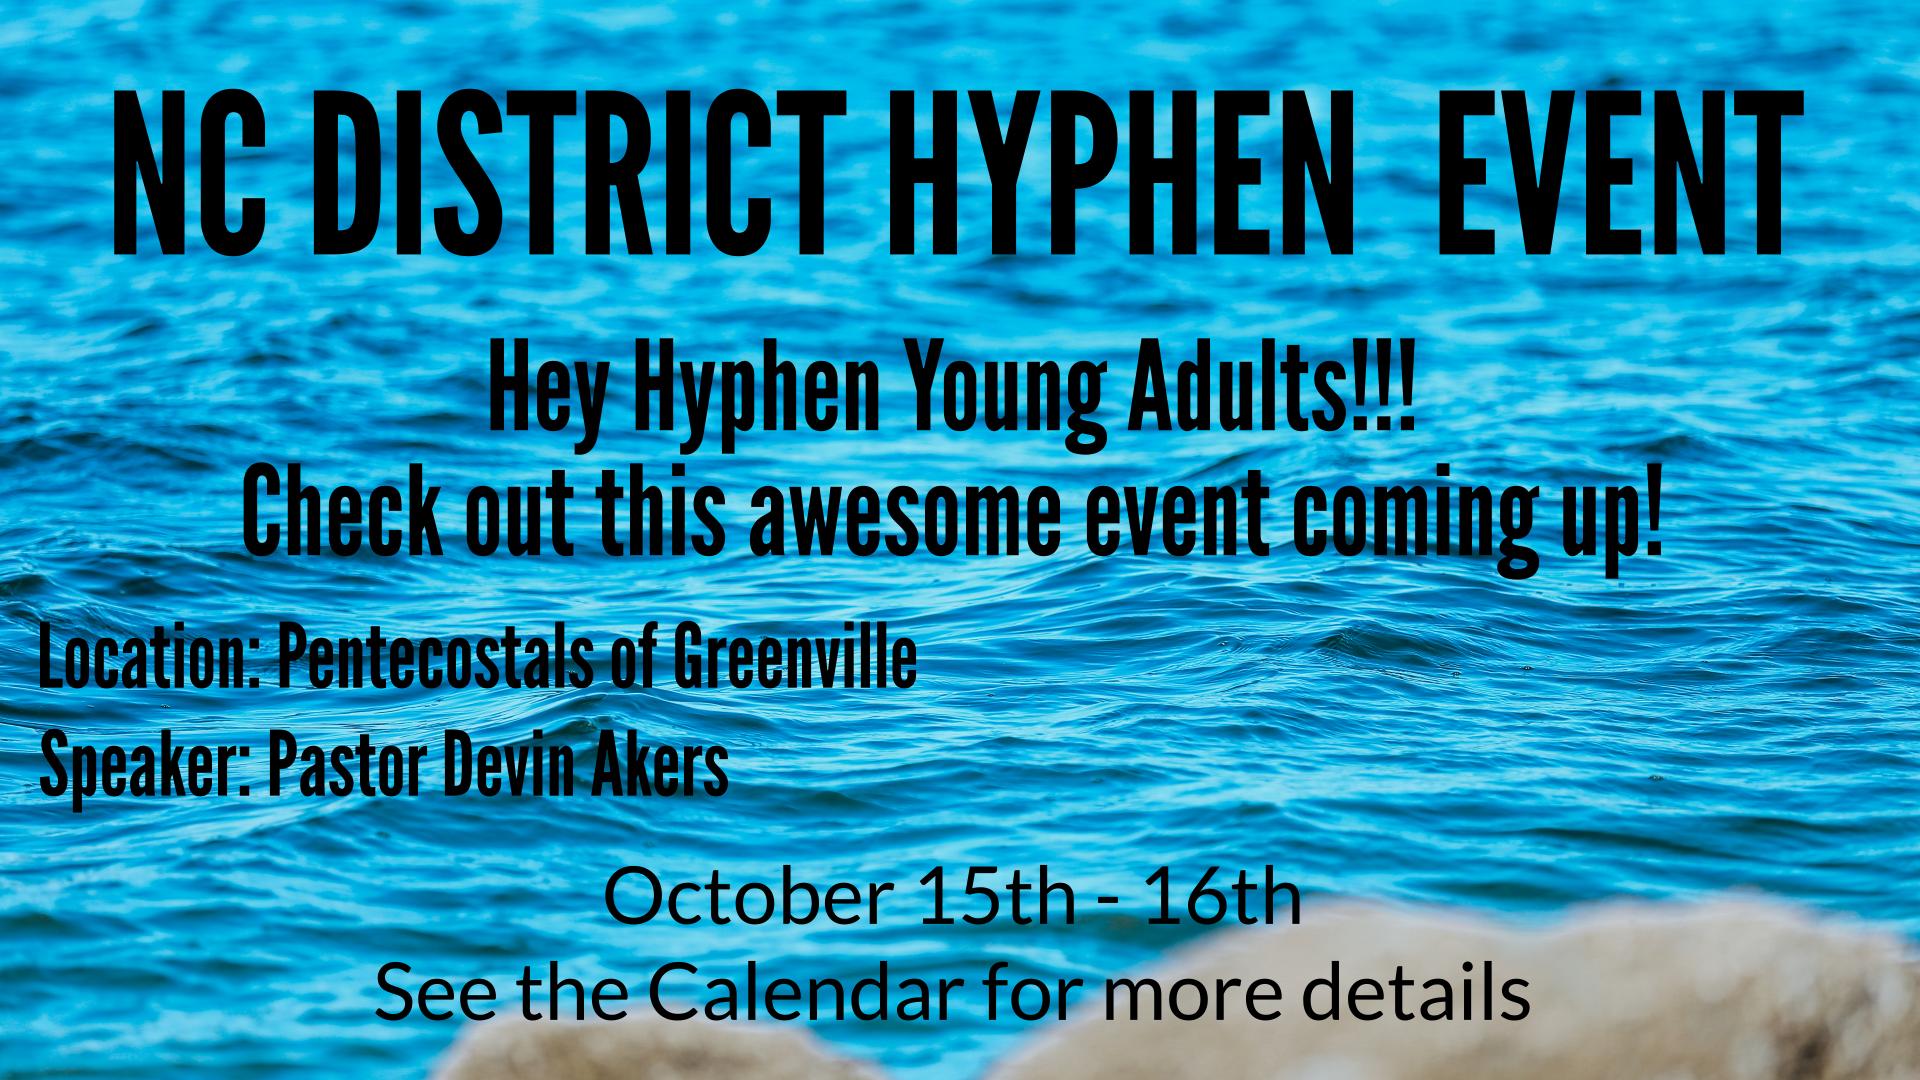 NC District Hyphen  Event